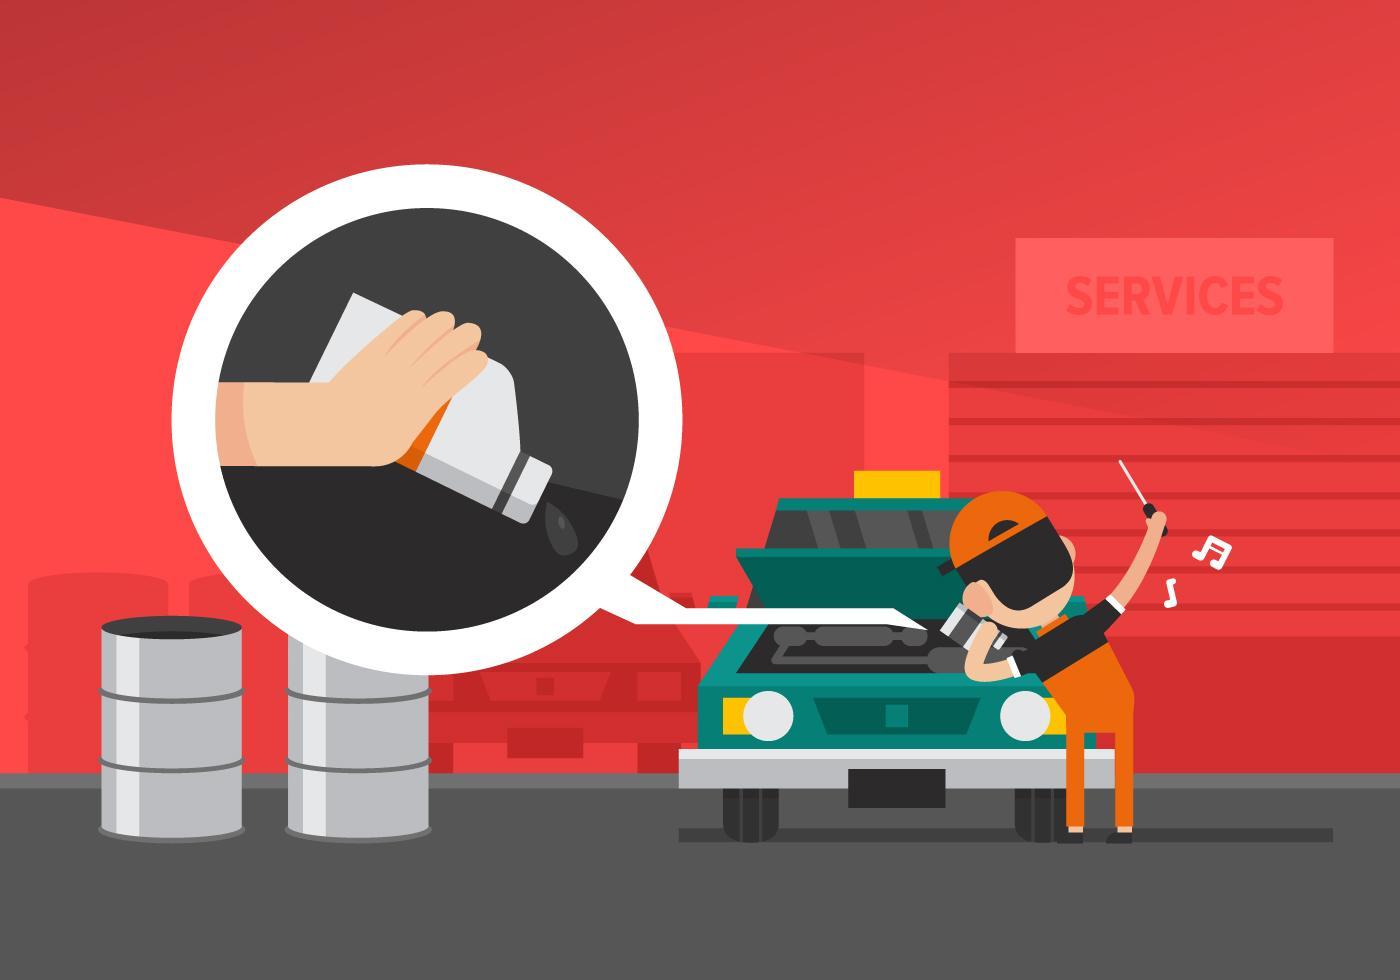 "<a href=""https://www.vecteezy.com/free-vector/tire"">Tire Vectors by Vecteezy</a>"